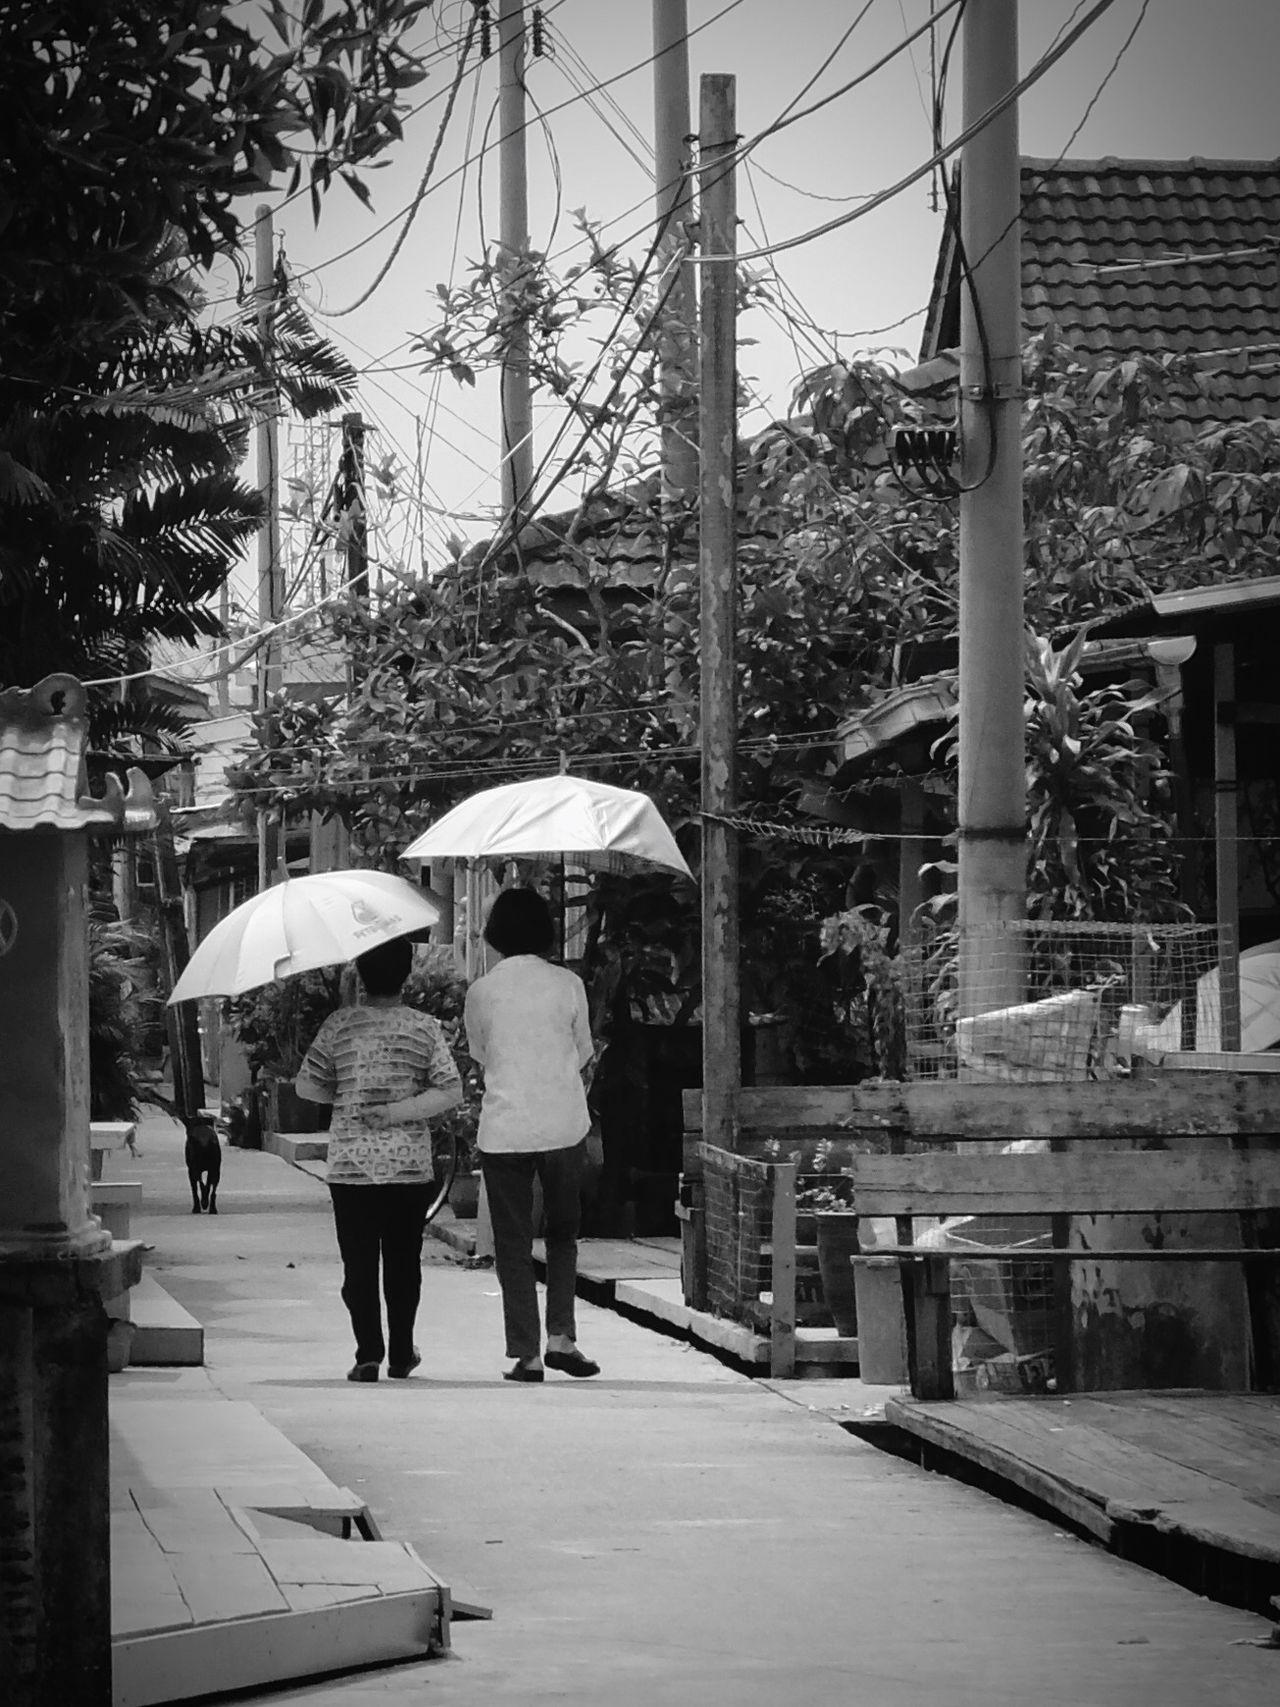 Streetphoto_bw Black & White Women Walking Around Street Photography Fortheloveofblackandwhite Bnw_friday_eyeemchallenge Monochrome